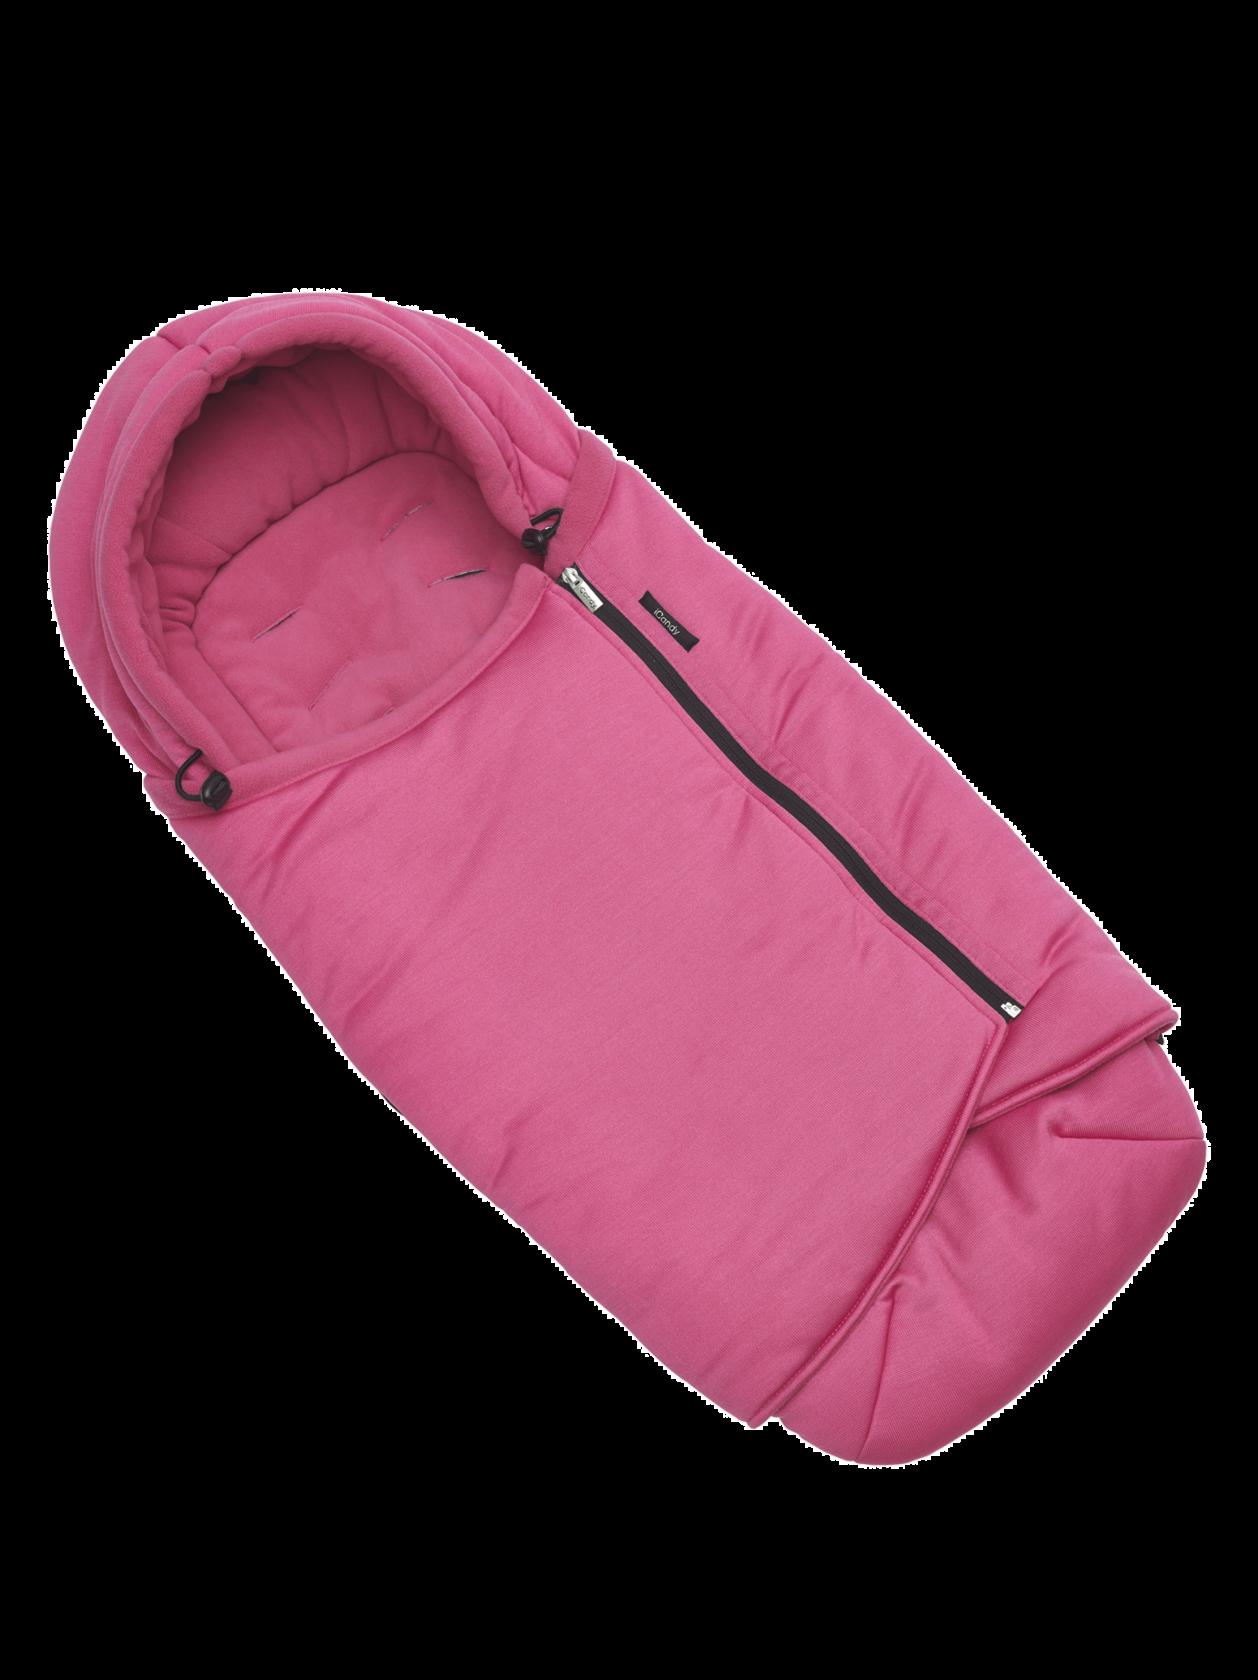 Newborn Pod for iCandy Peach Main Carrycot - Fuchsia